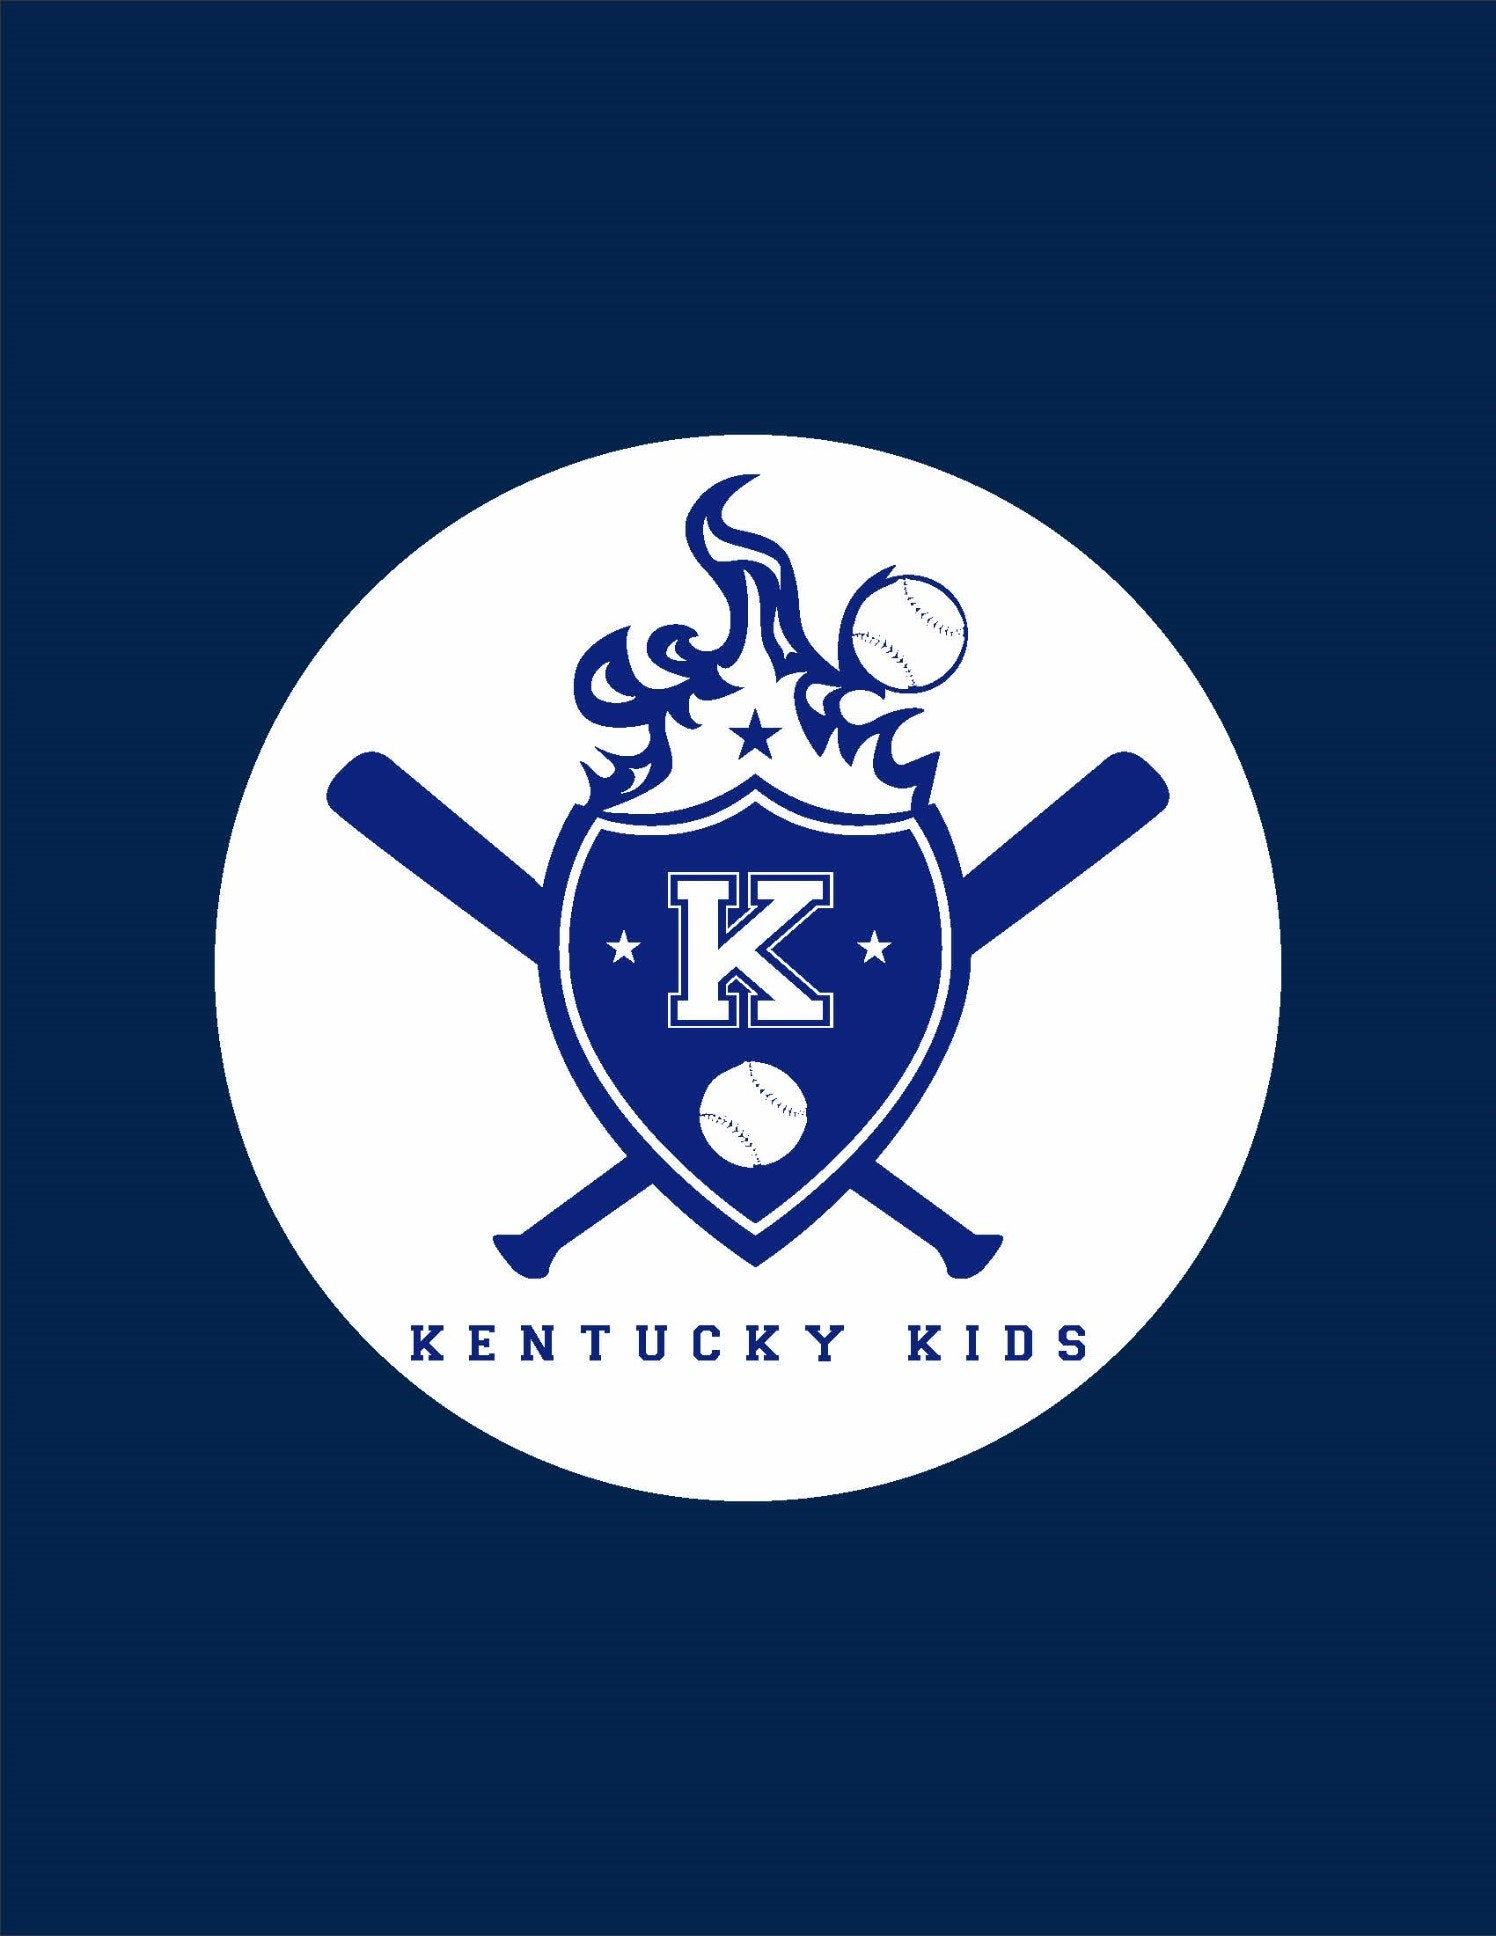 KY Kids National Tournament